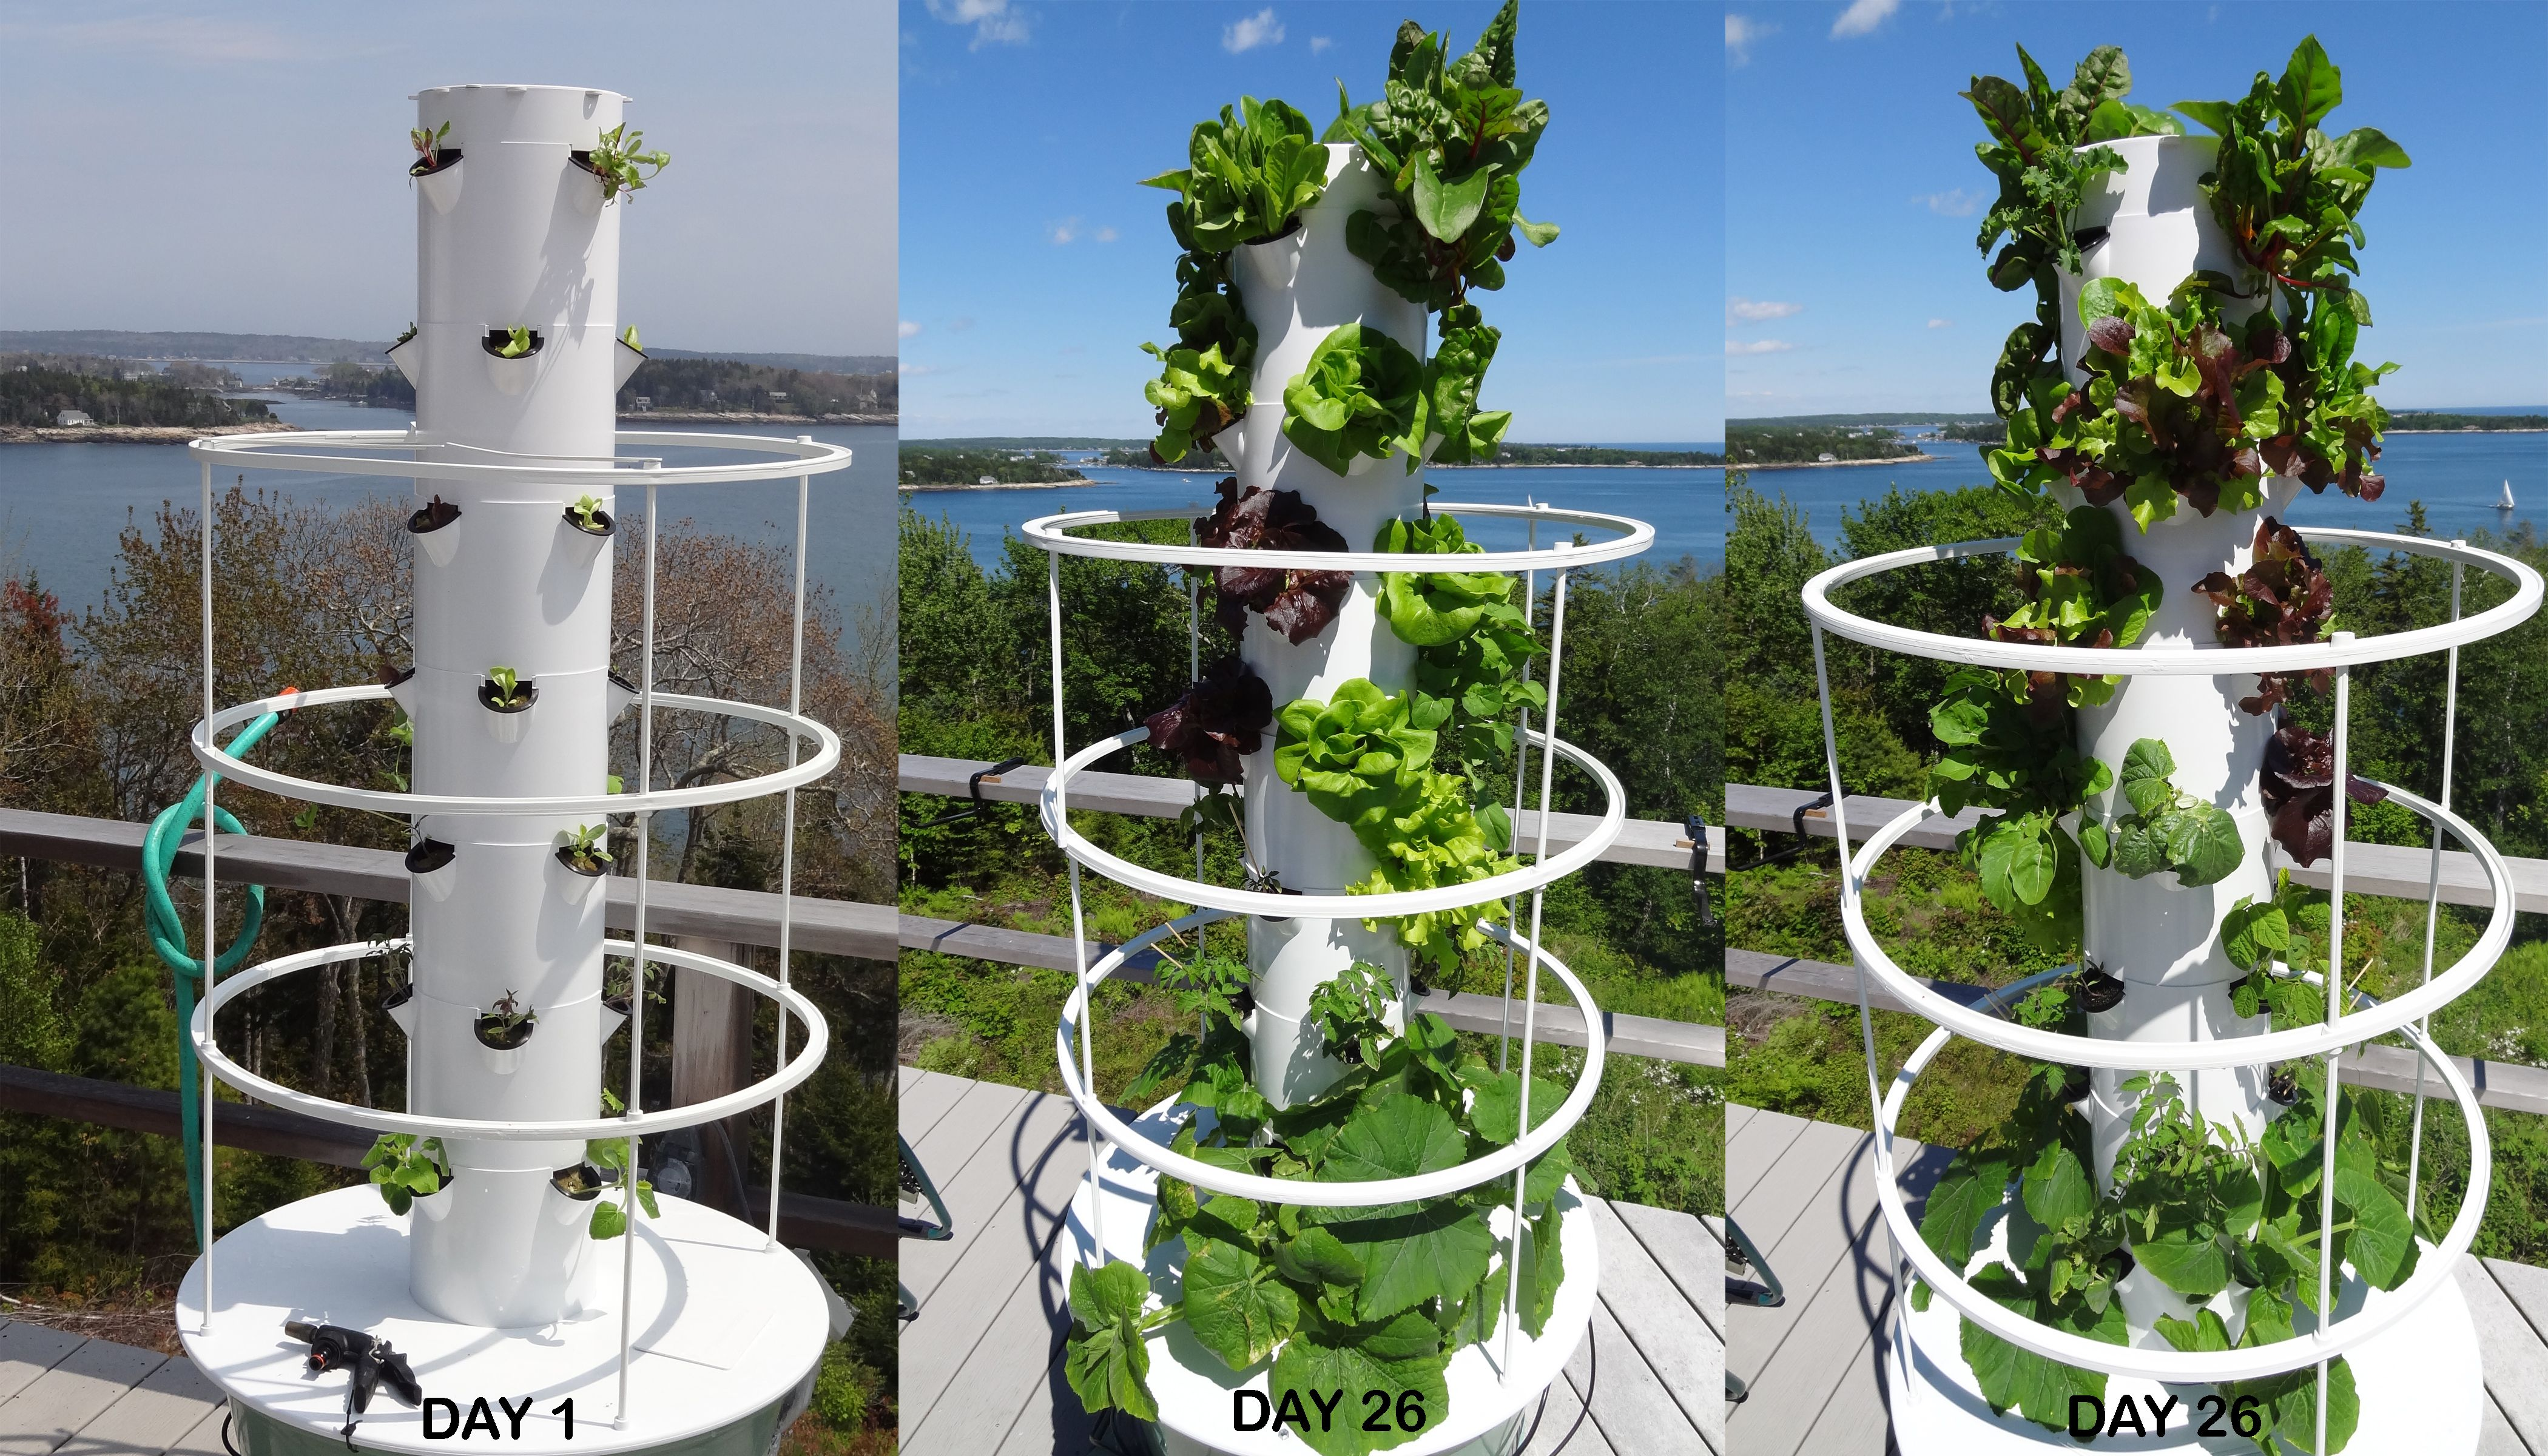 My Aeroponic Tower Garden at Day 26 Tower garden